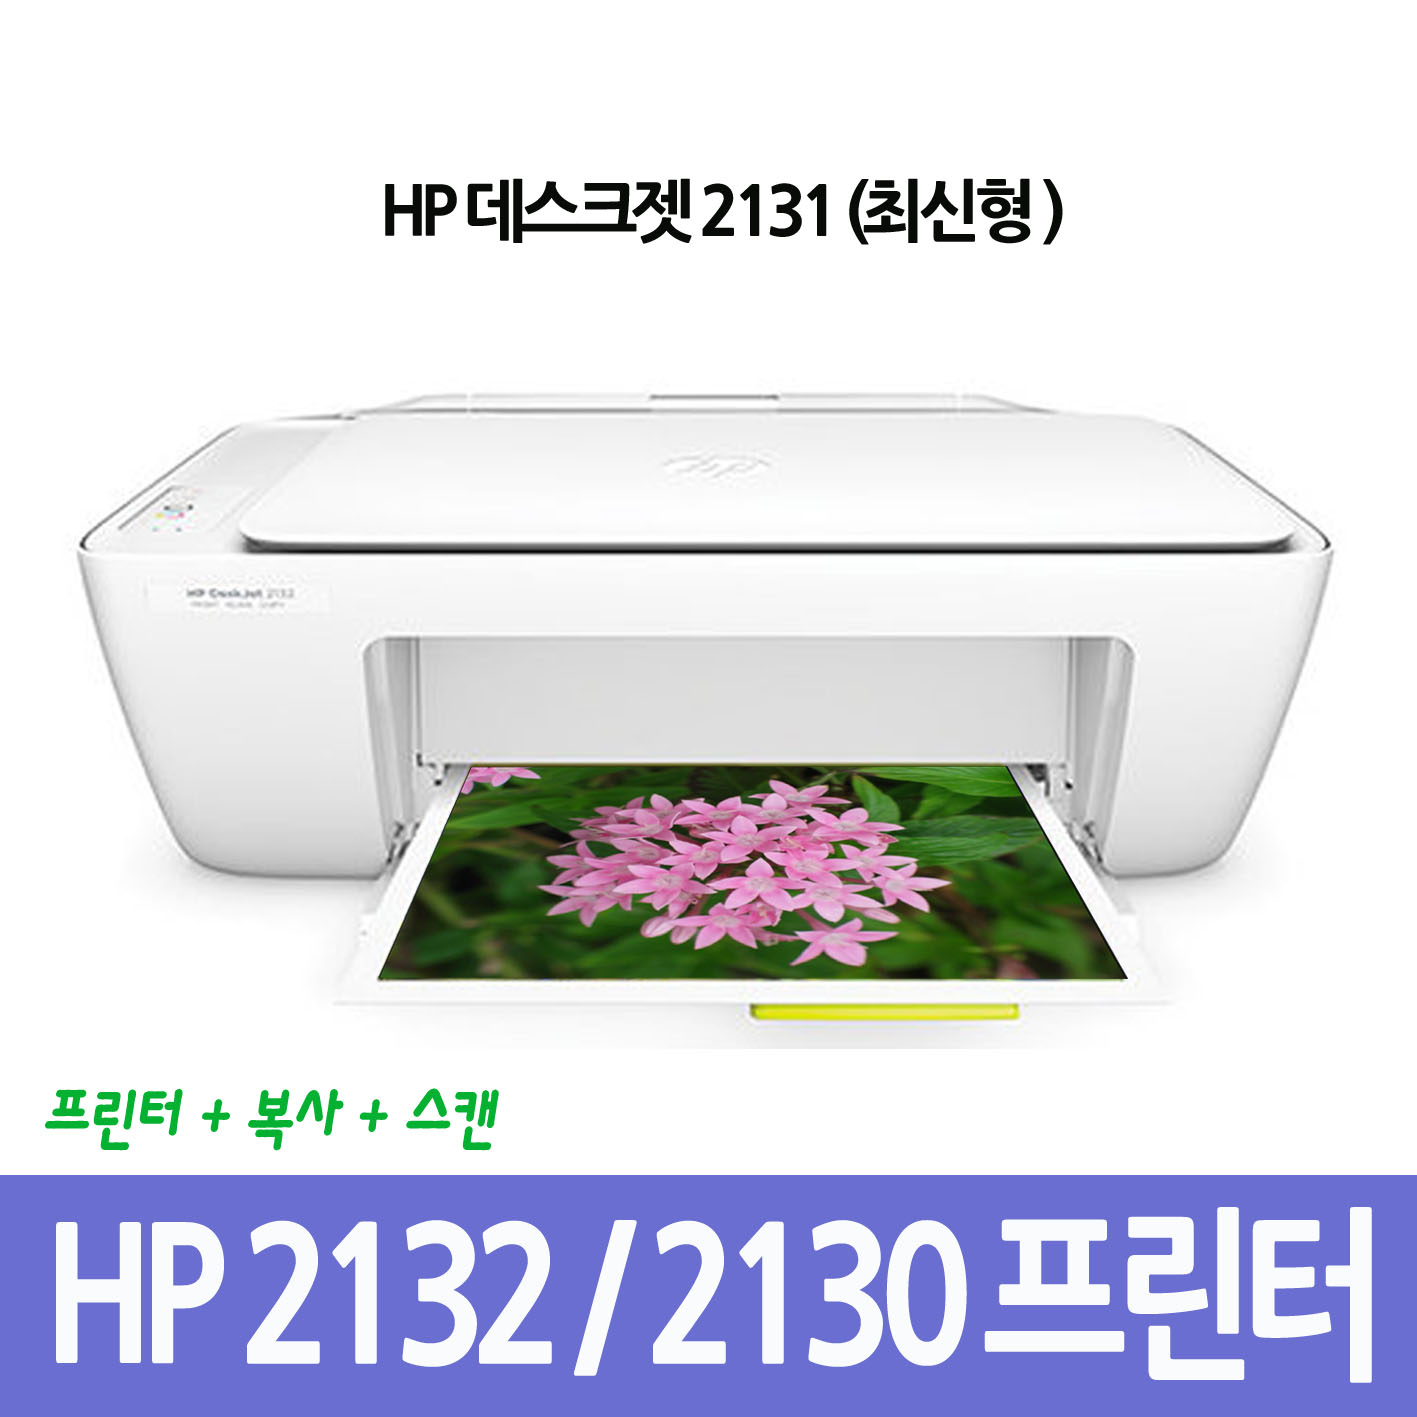 HP 데스크젯 2131 2130 2132 프린터 잉크젯 복합기, 화이트, HP2132(잉크없음)